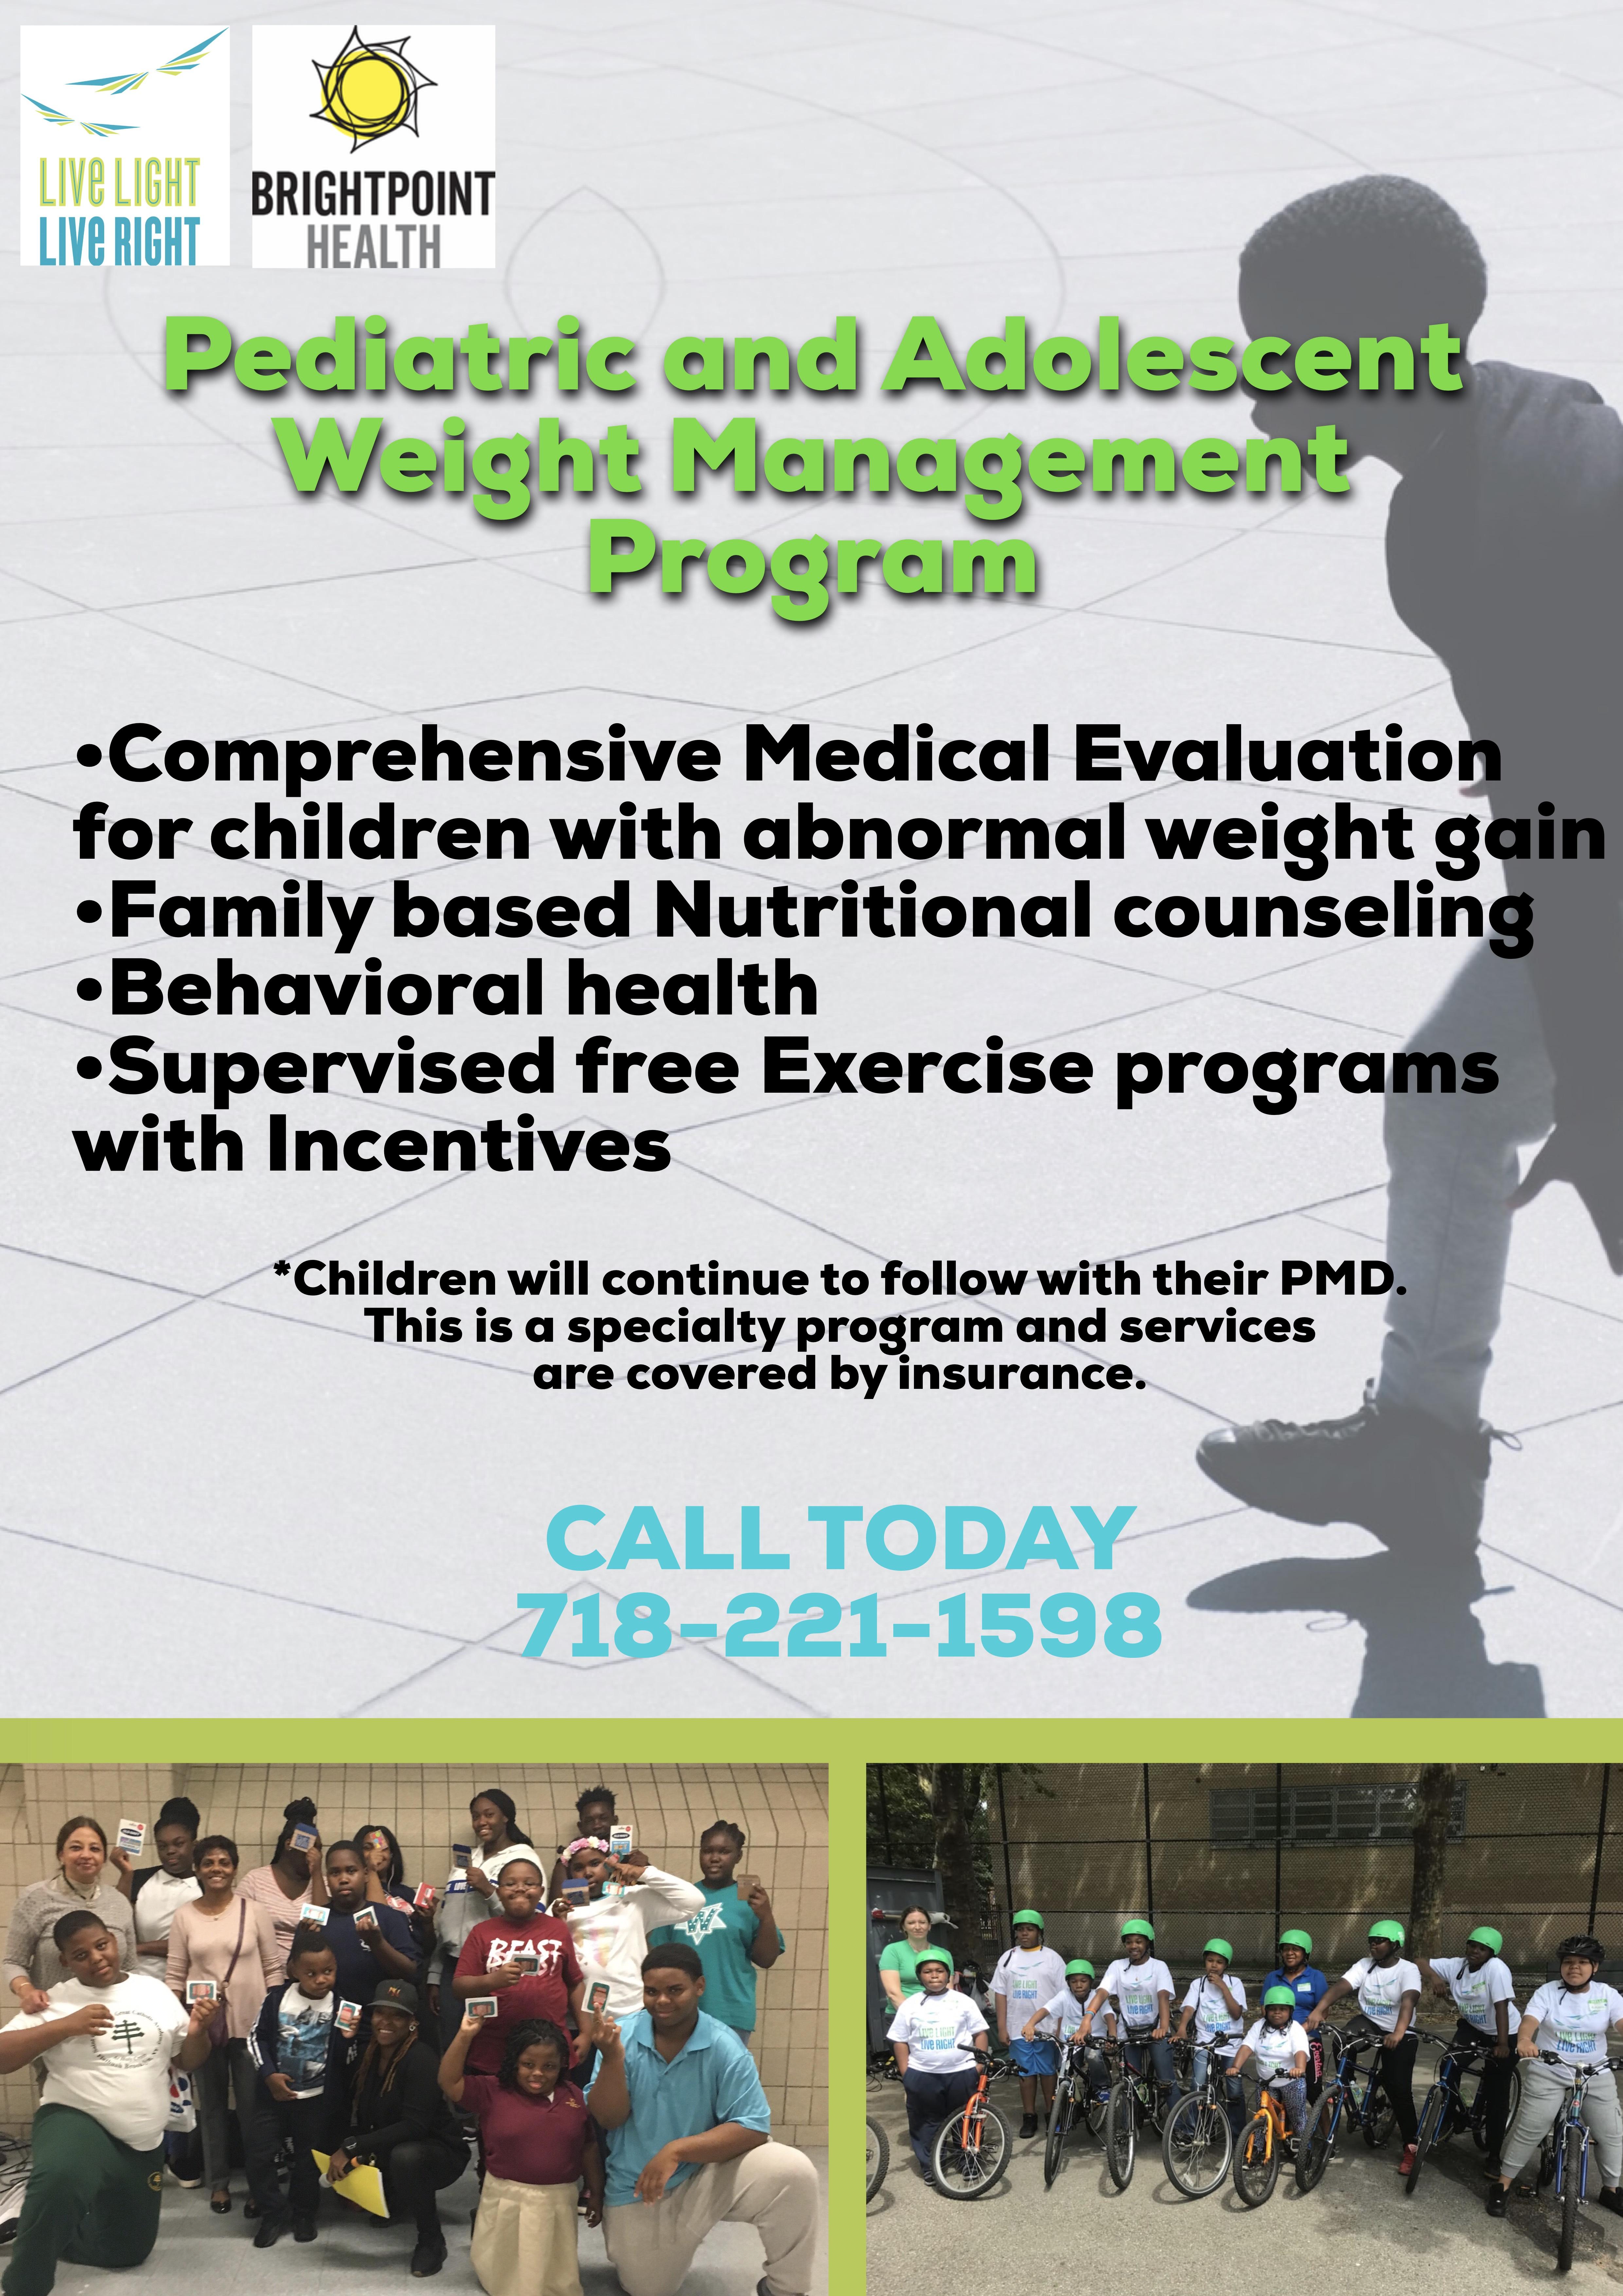 childhood obesity – Live Light Live Right